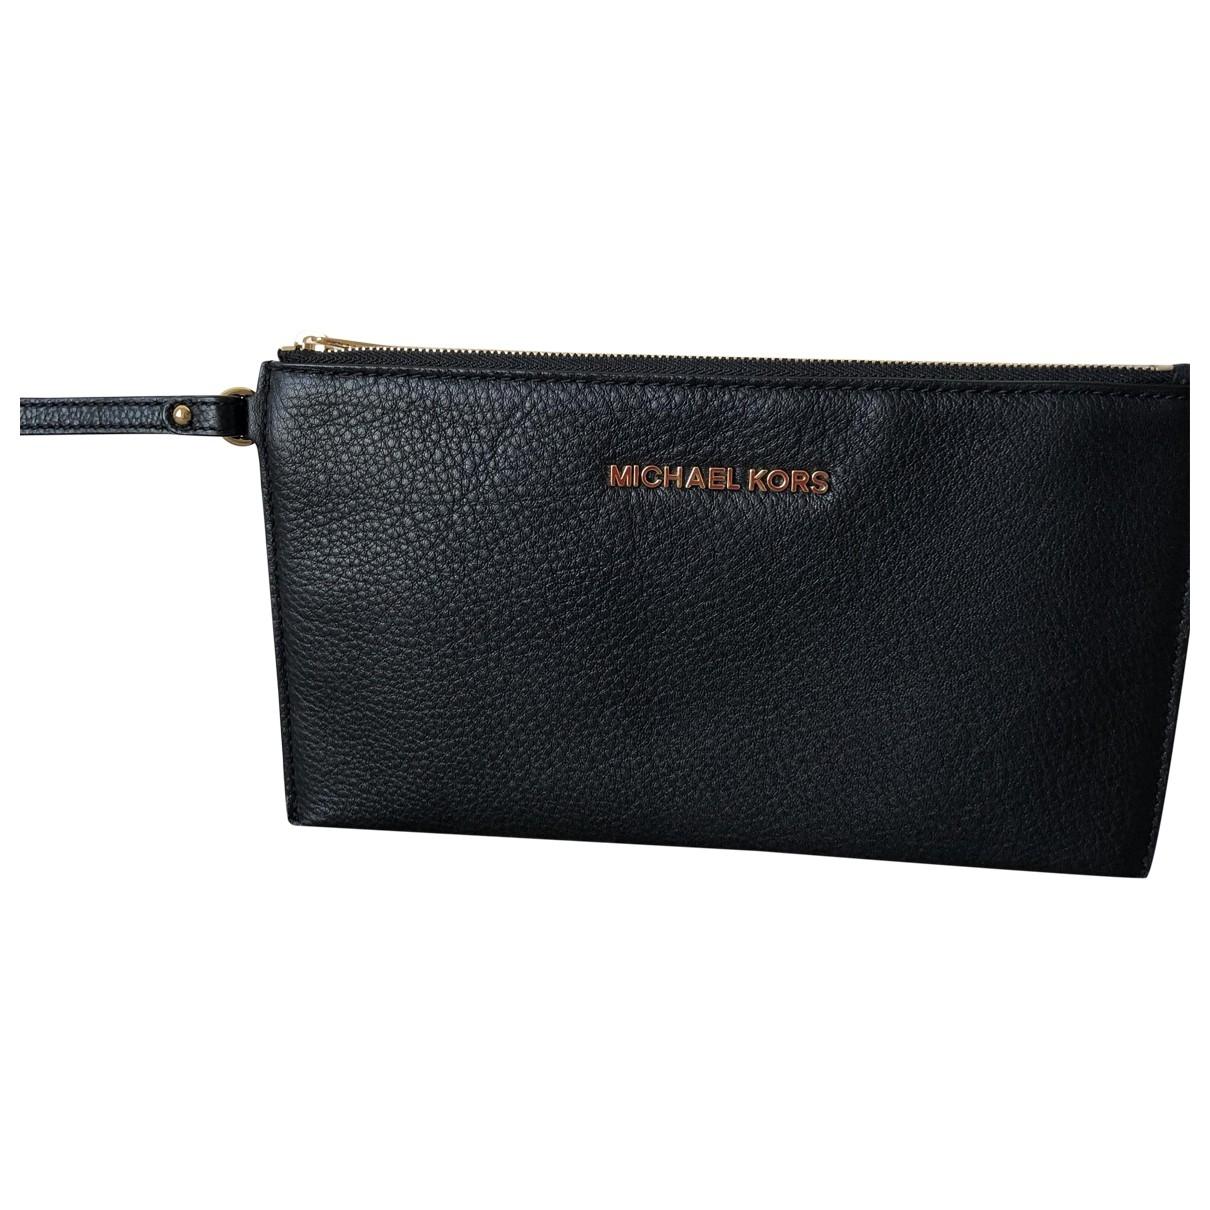 Michael Kors \N Black Leather Clutch bag for Women \N